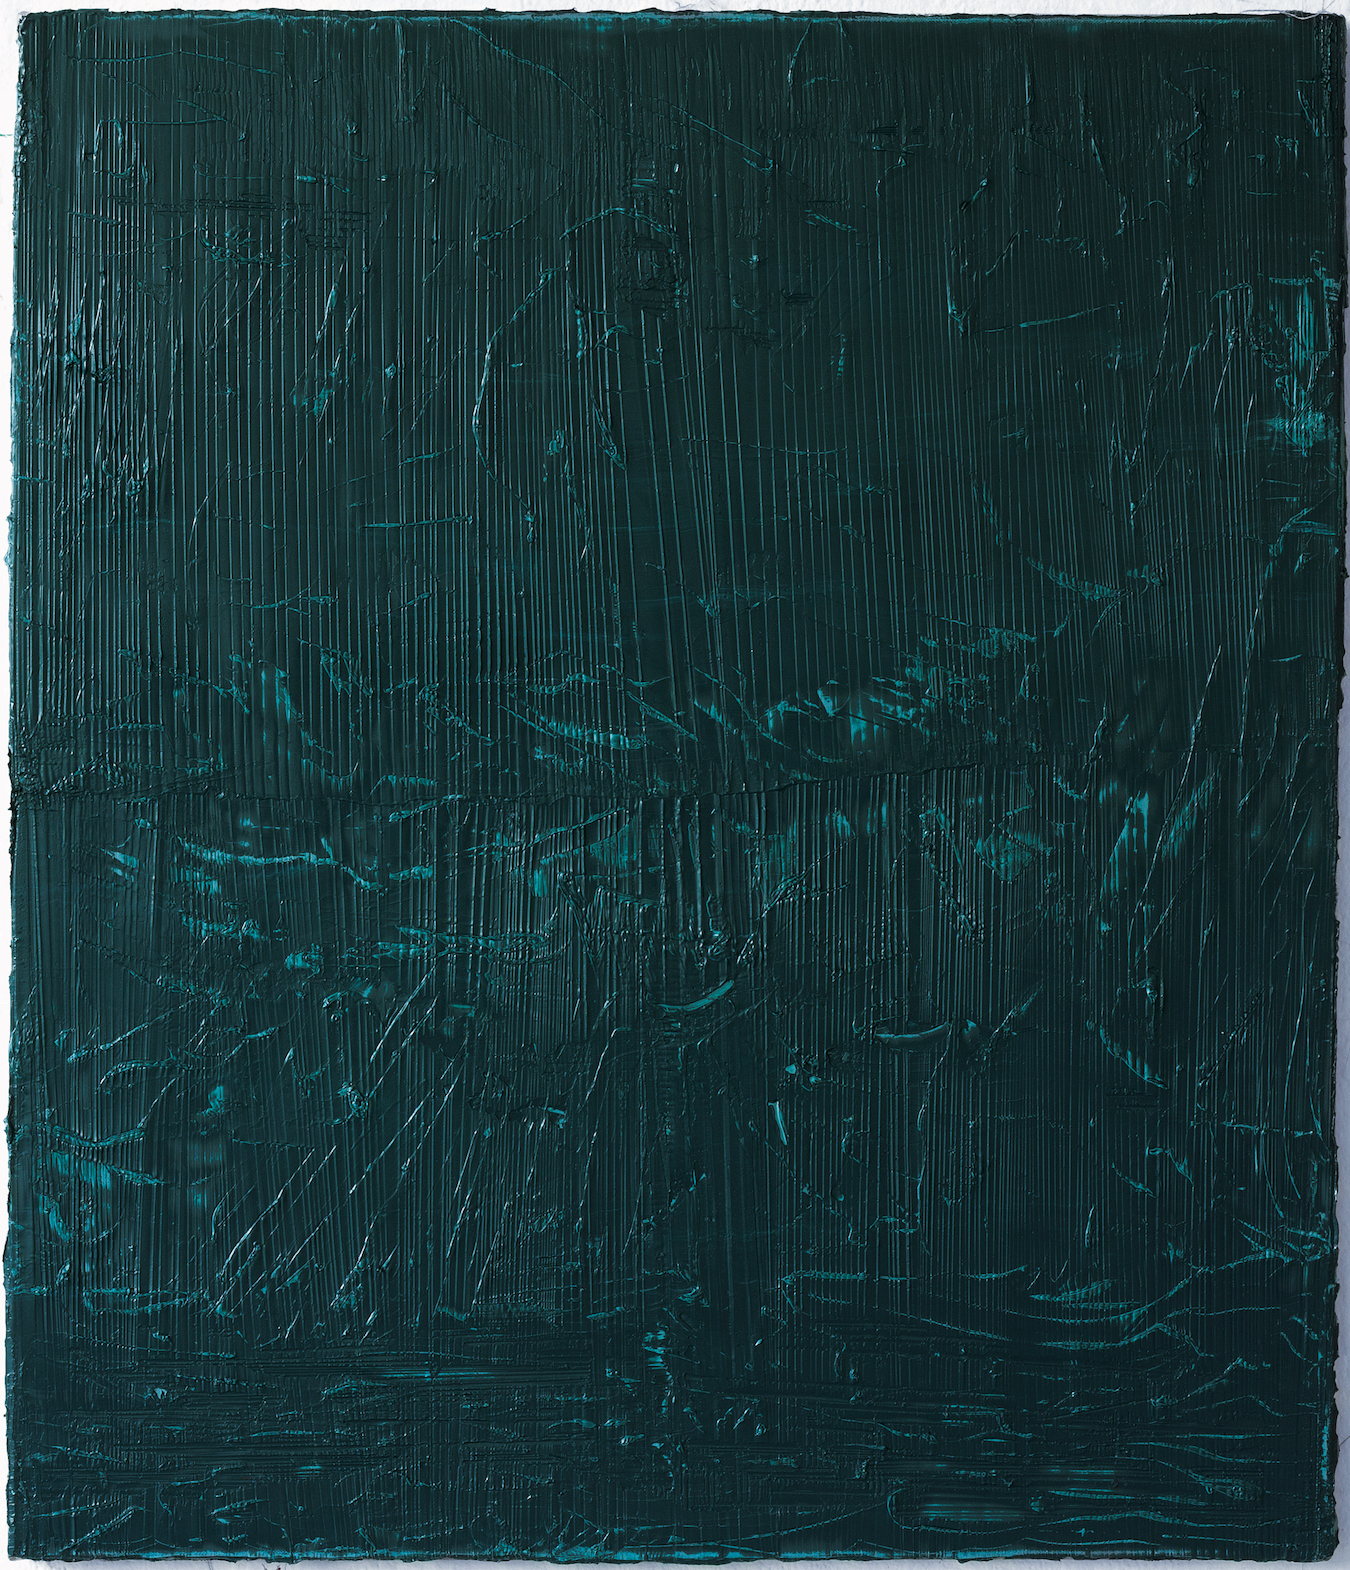 Felix Becker_untitled (shores) 2019_oil on linen_105 x 90 cm_web